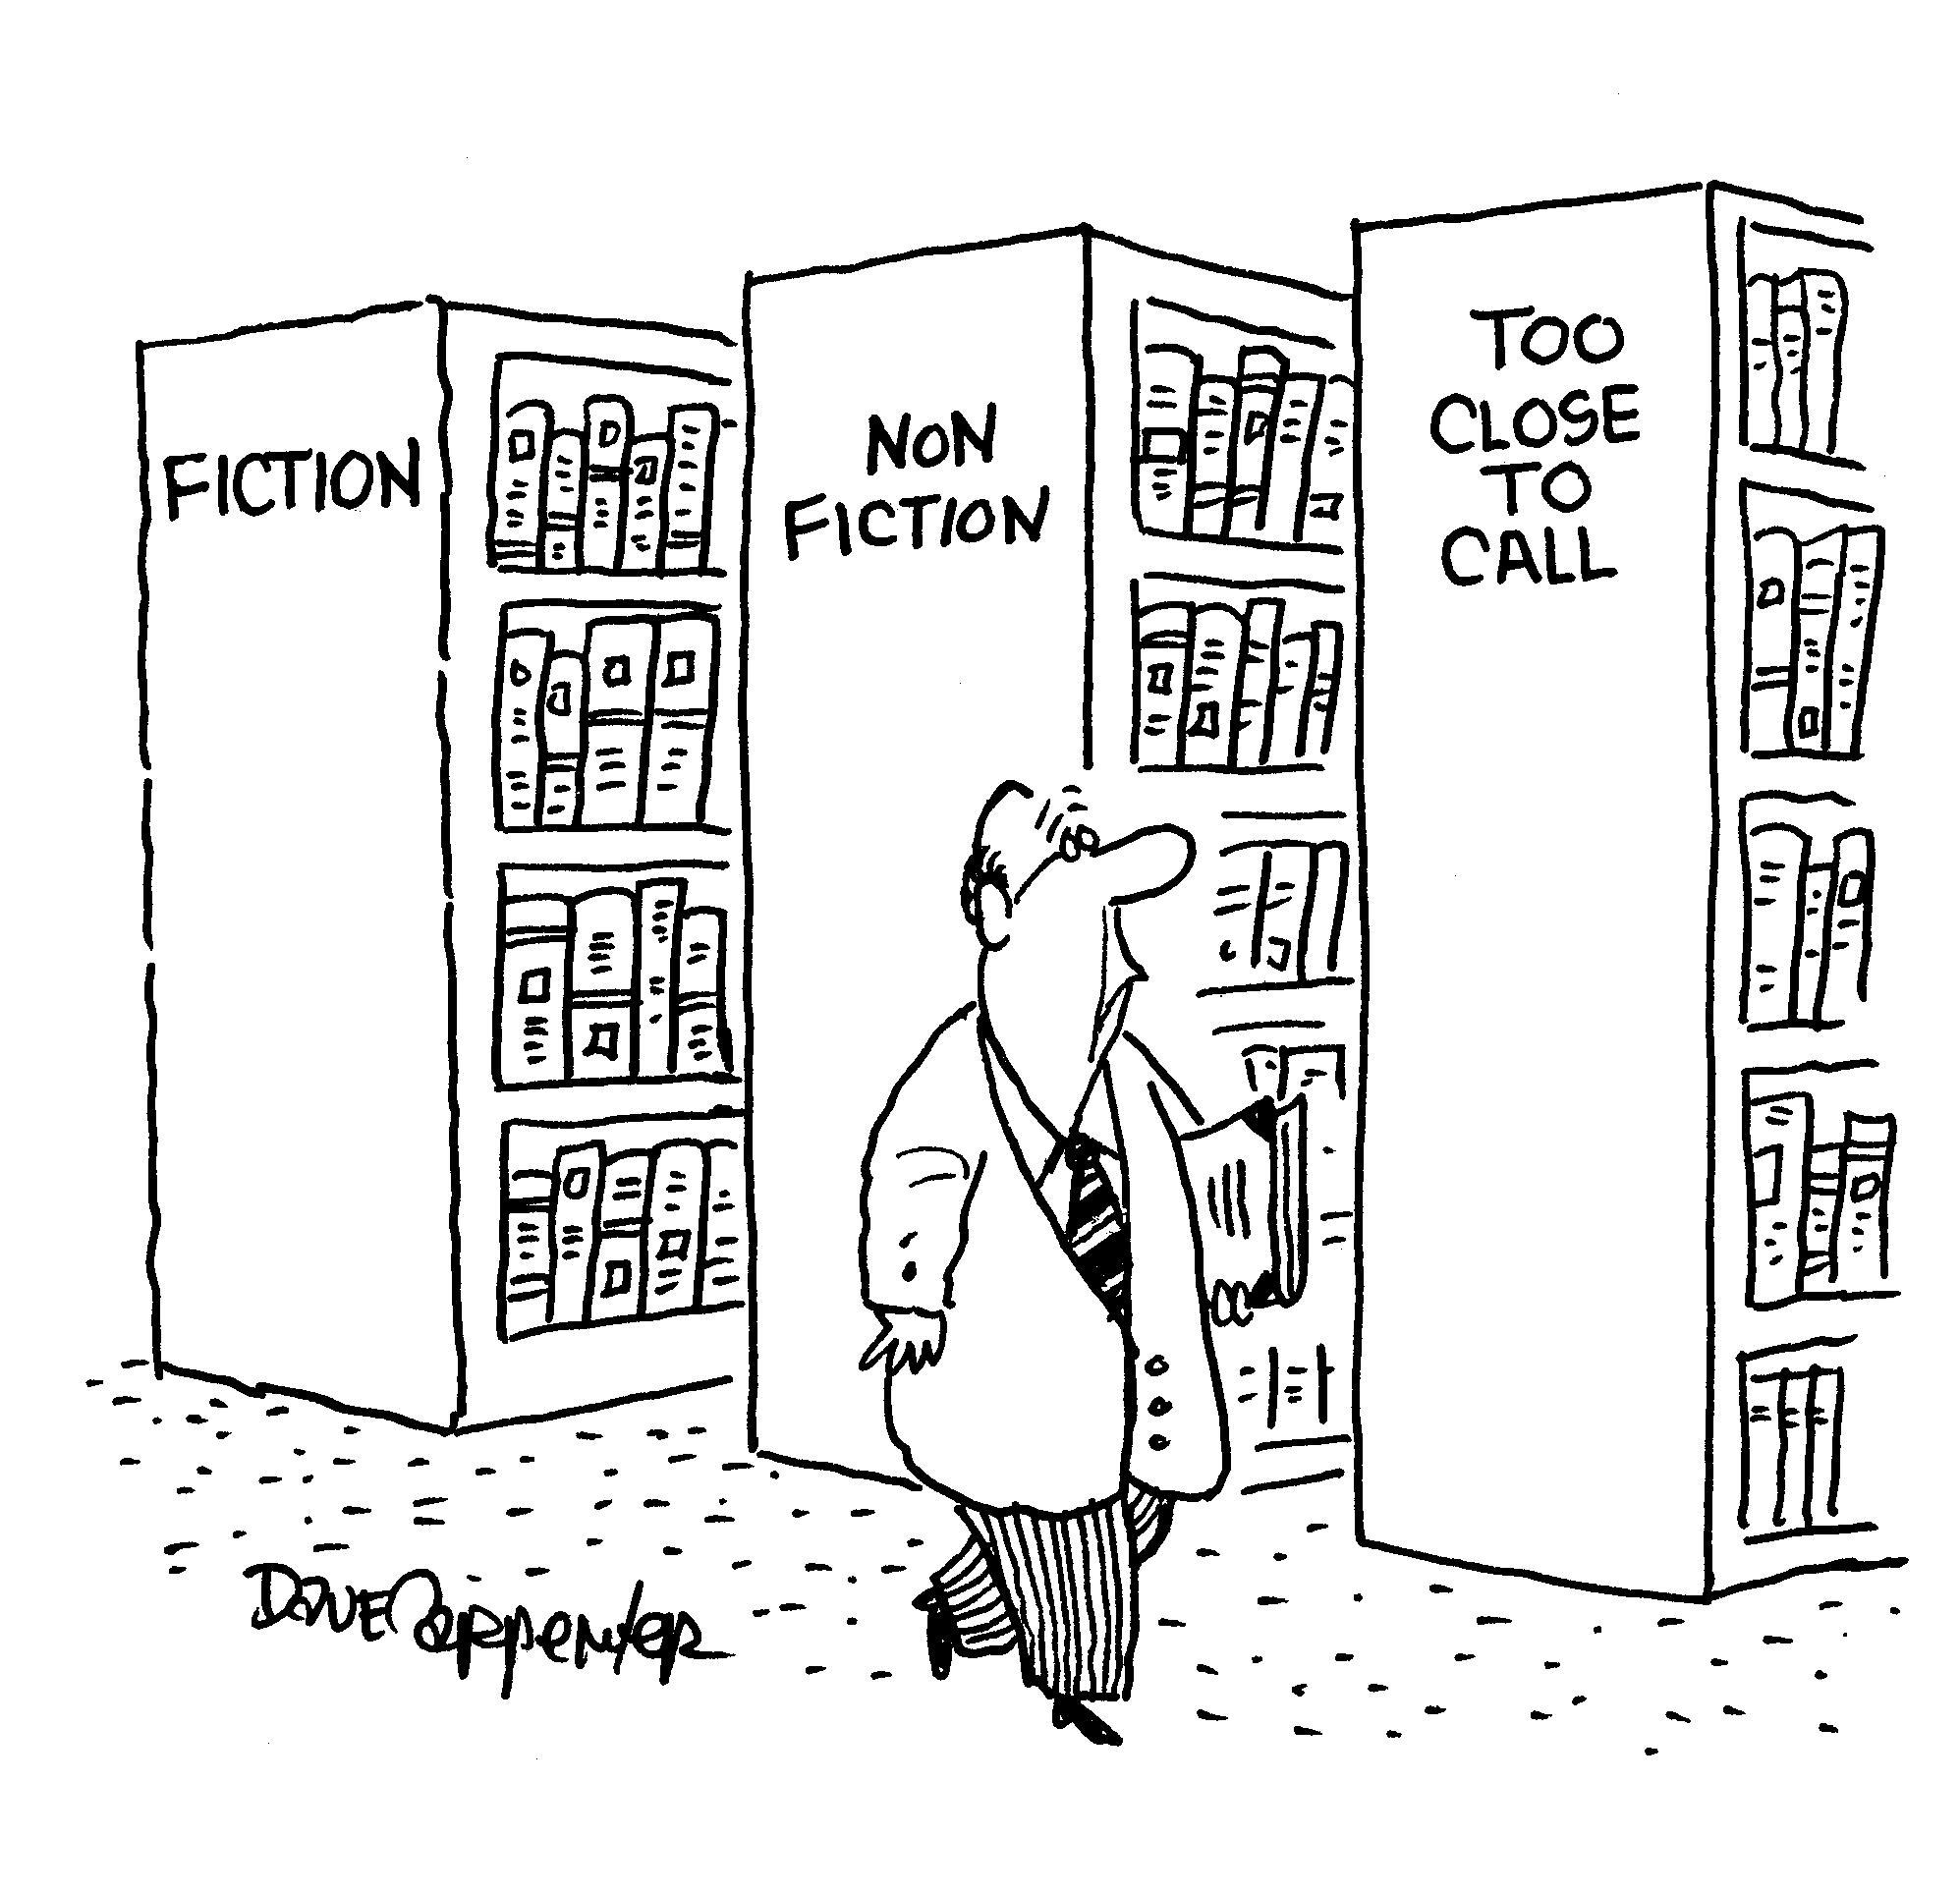 nonfiction-cartoon